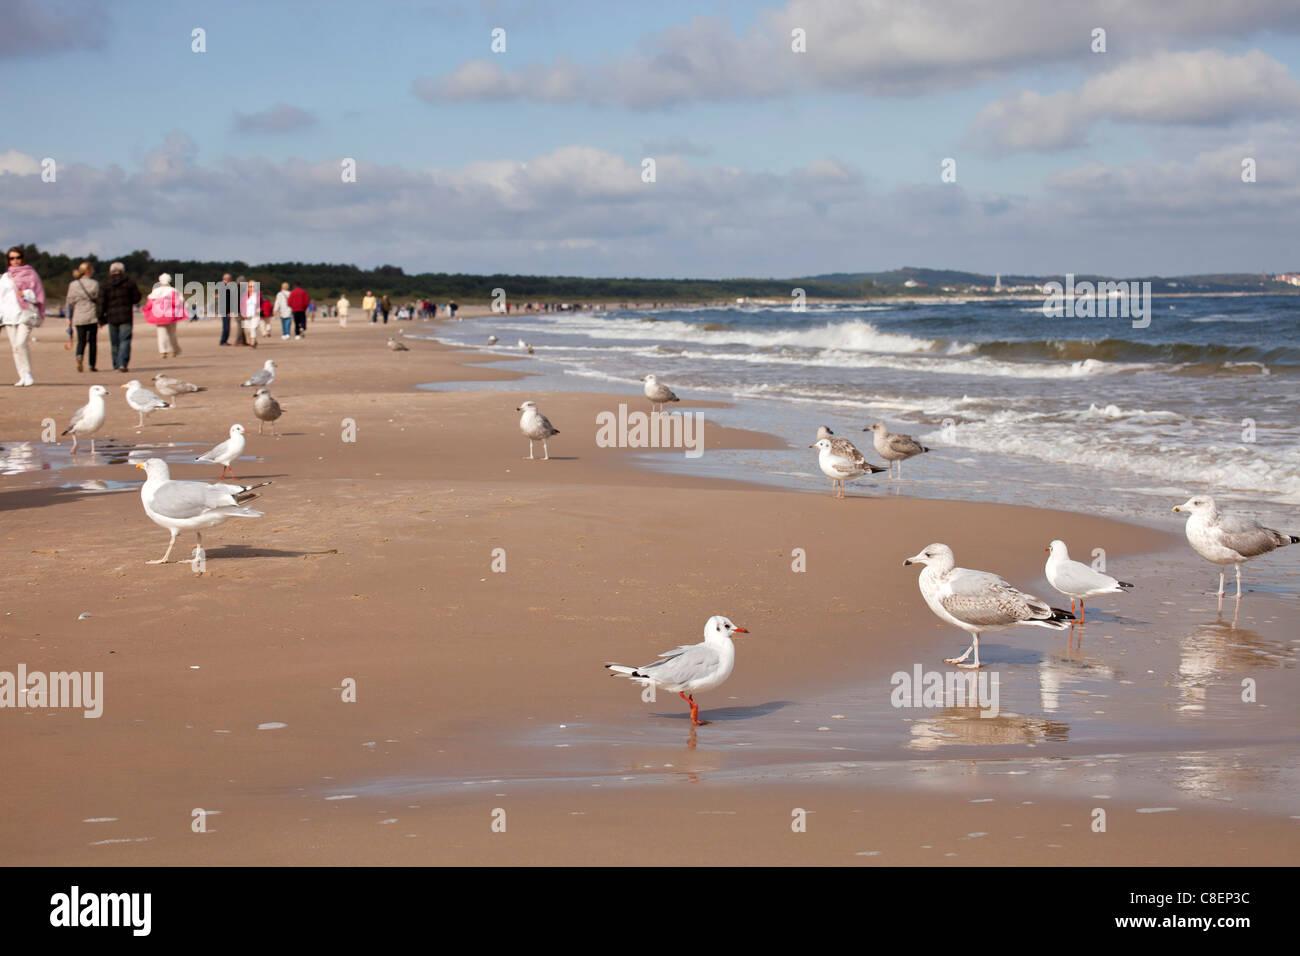 seagulls at the beach of the polish seaside resort Swinoujscie, Uznam Island, Poland, Europe Stock Photo